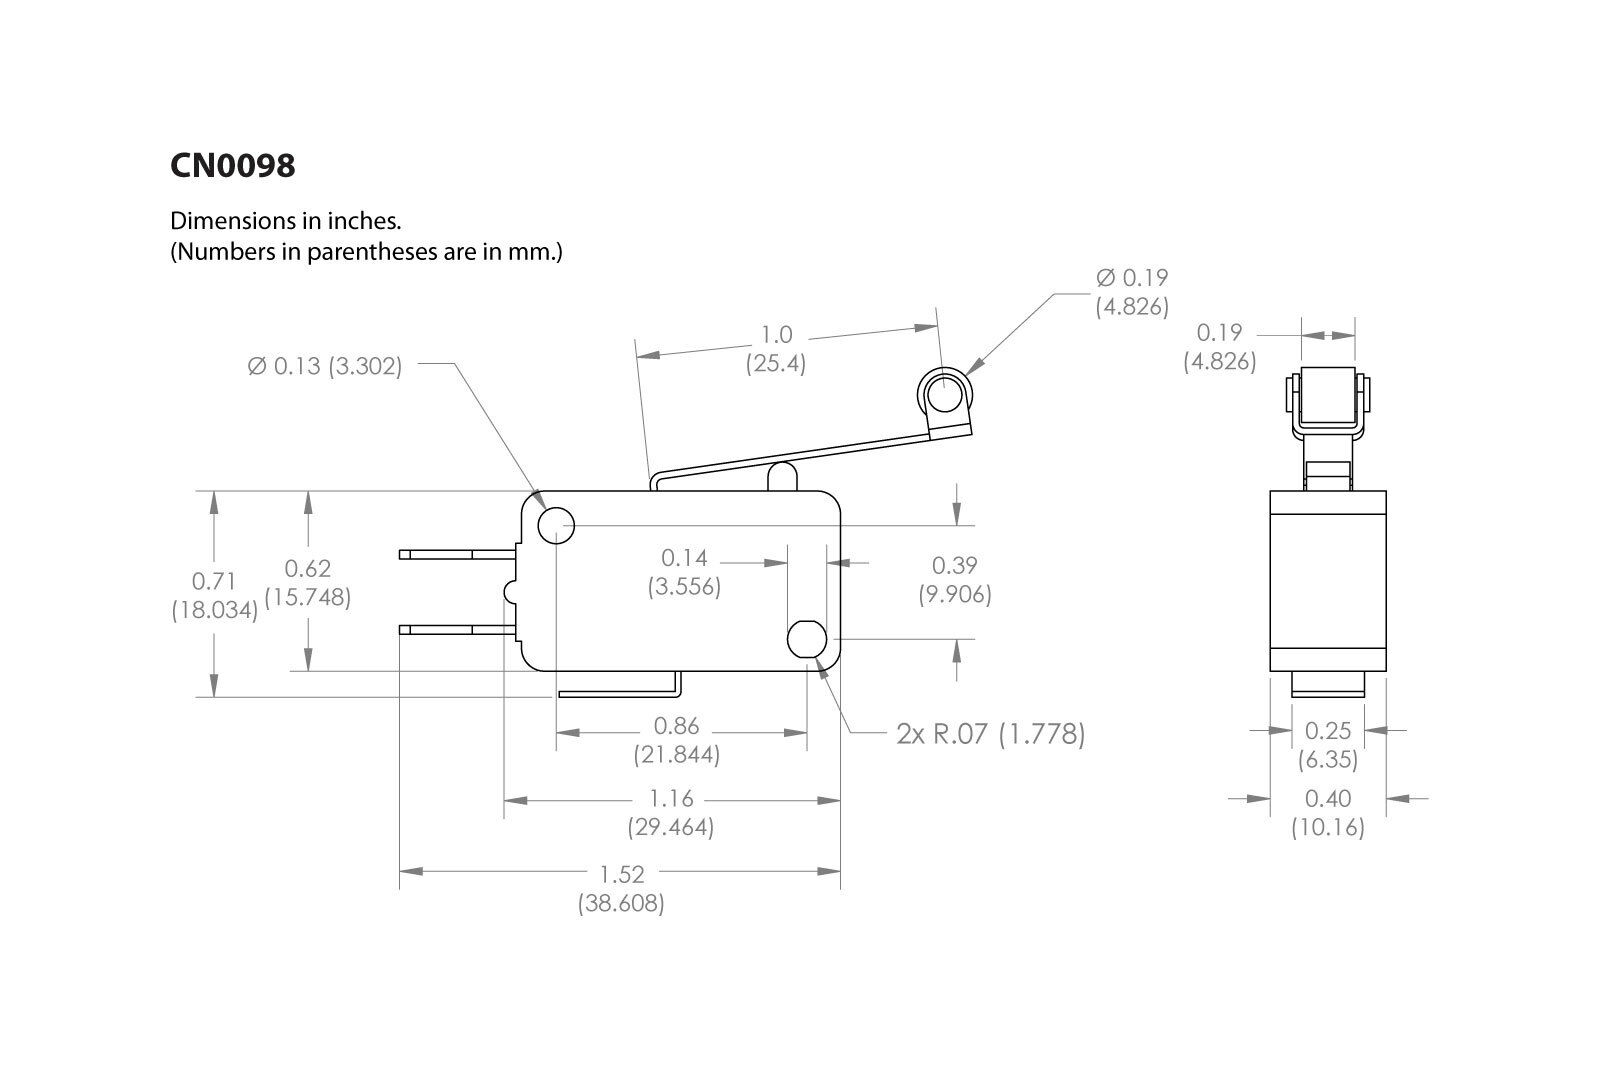 Roller Micro Switch Spdt Wiring Diagram Smart Diagrams 3 Pc Temco Limit Long Lever Arm Snap Action Rh Ebay Com Dpdt